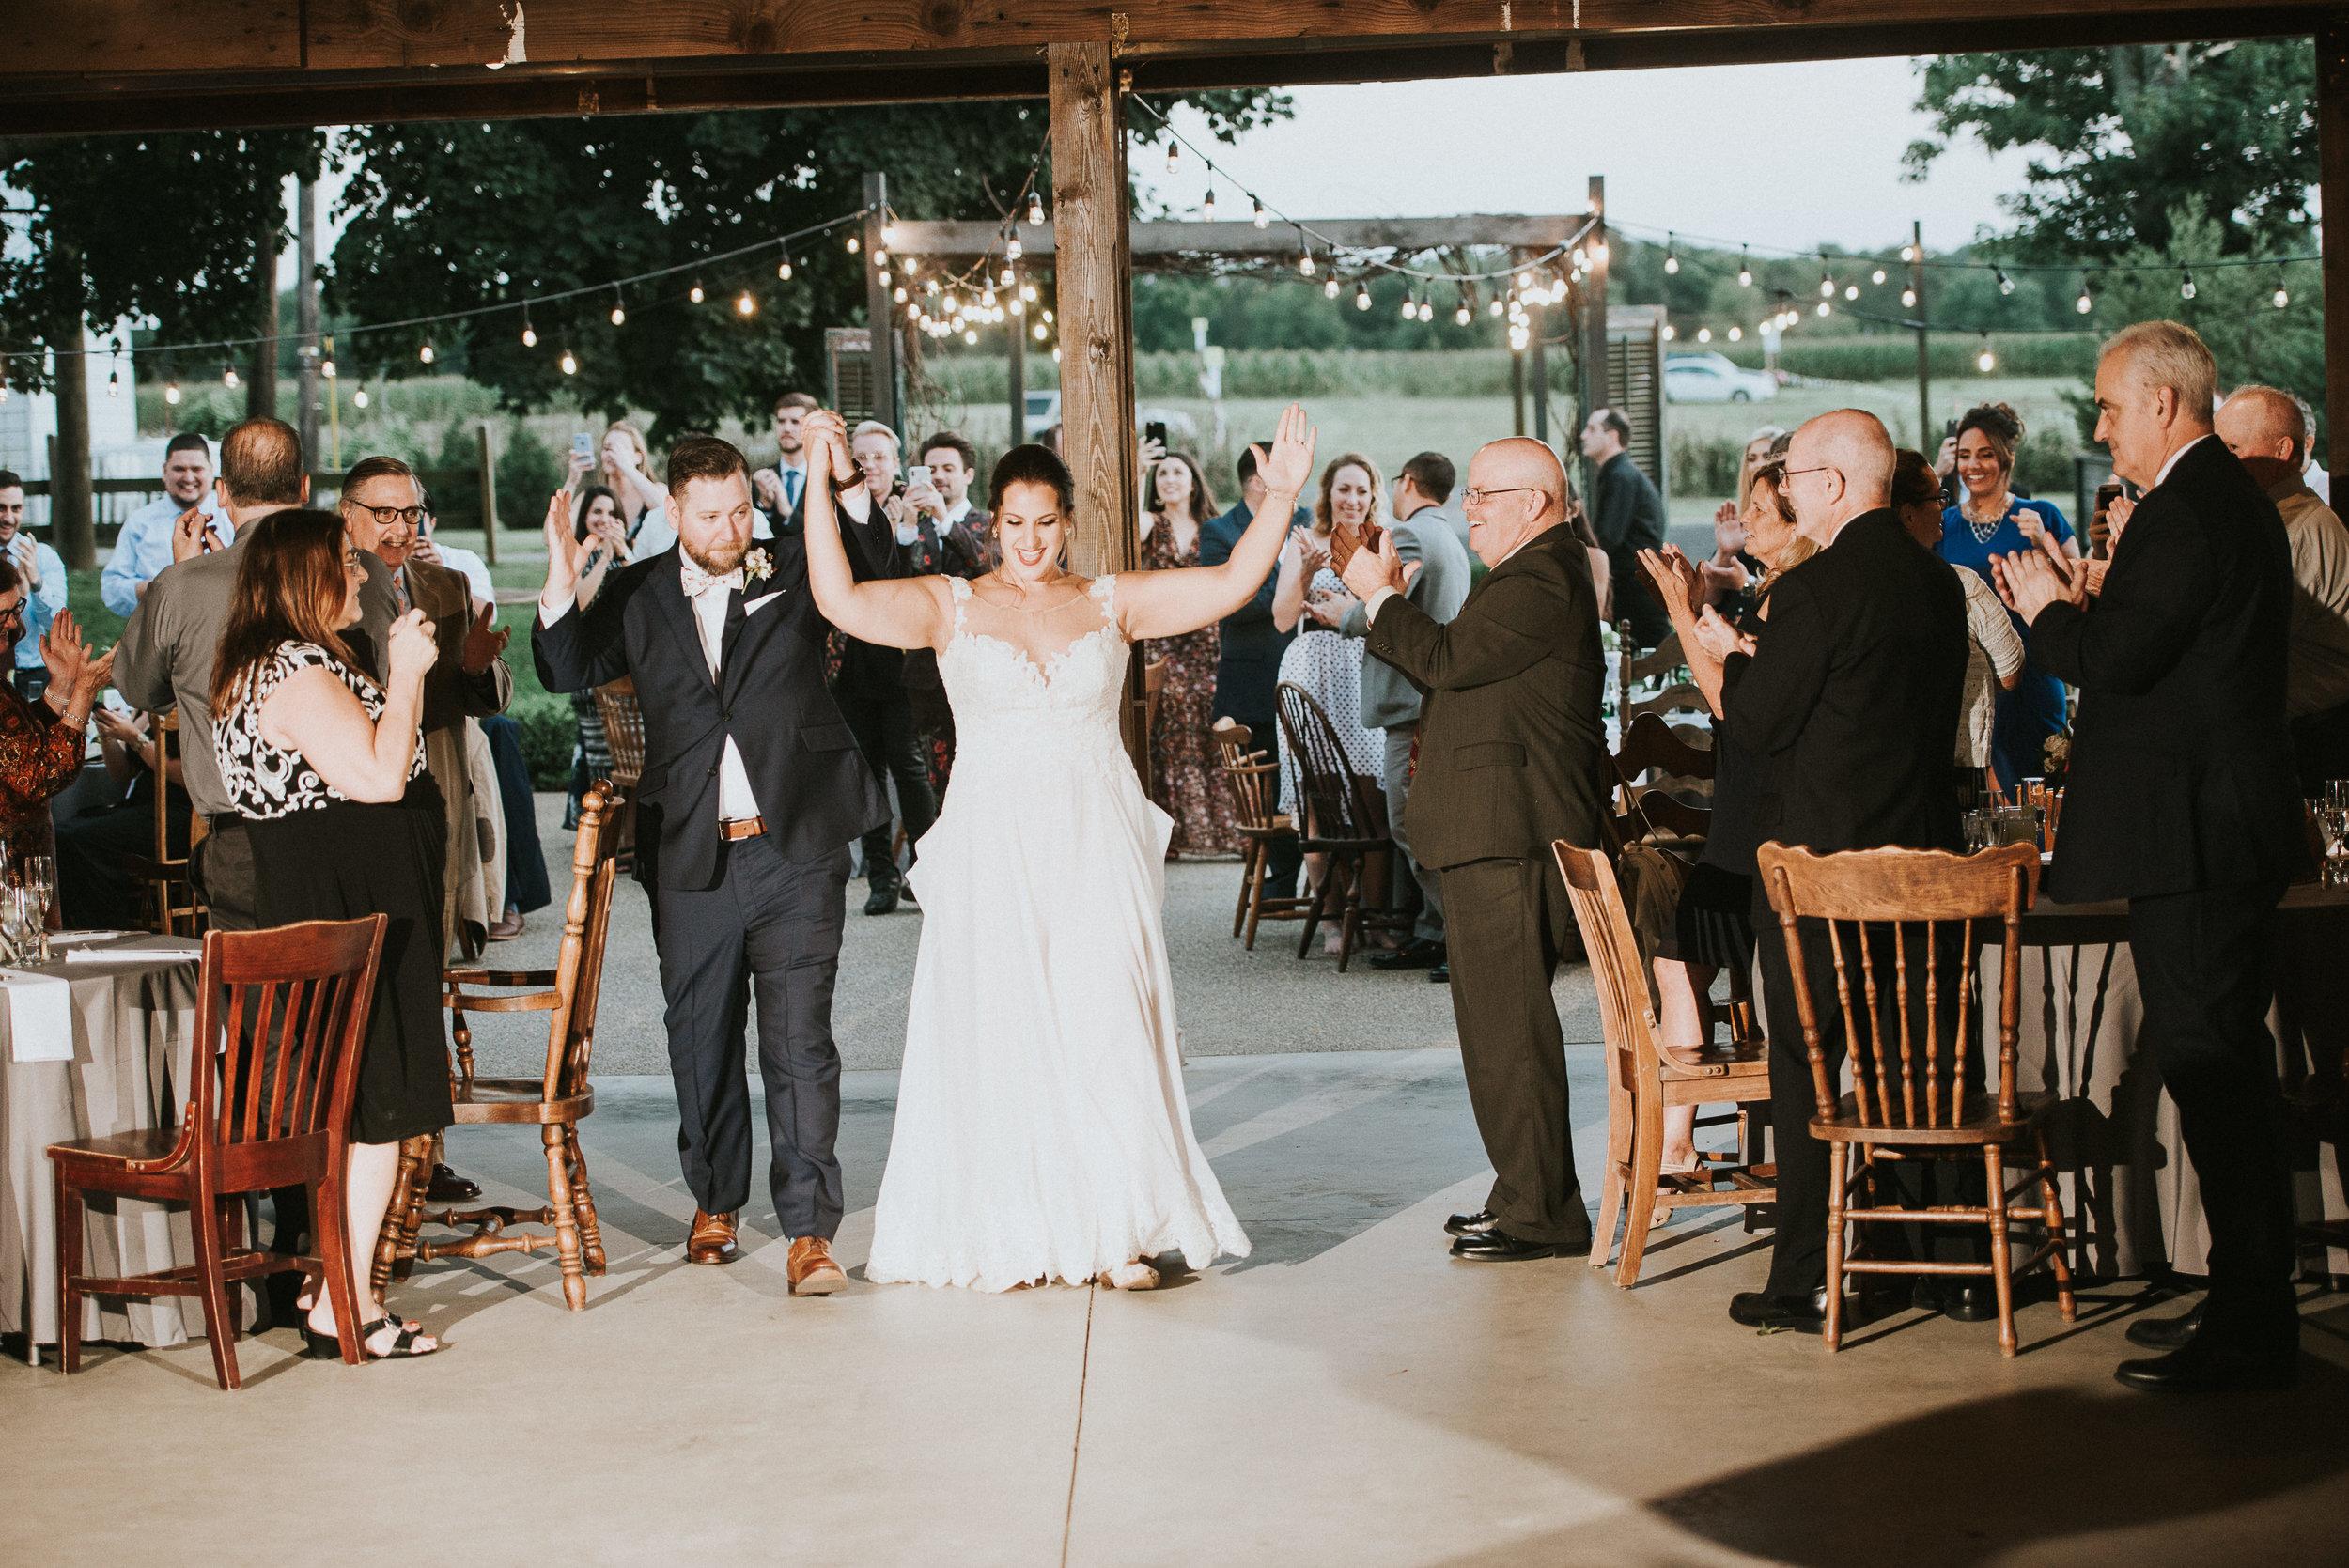 Johnson-Locust-Hall-Farm-Wedding-Christine-Kevin-1167.jpg